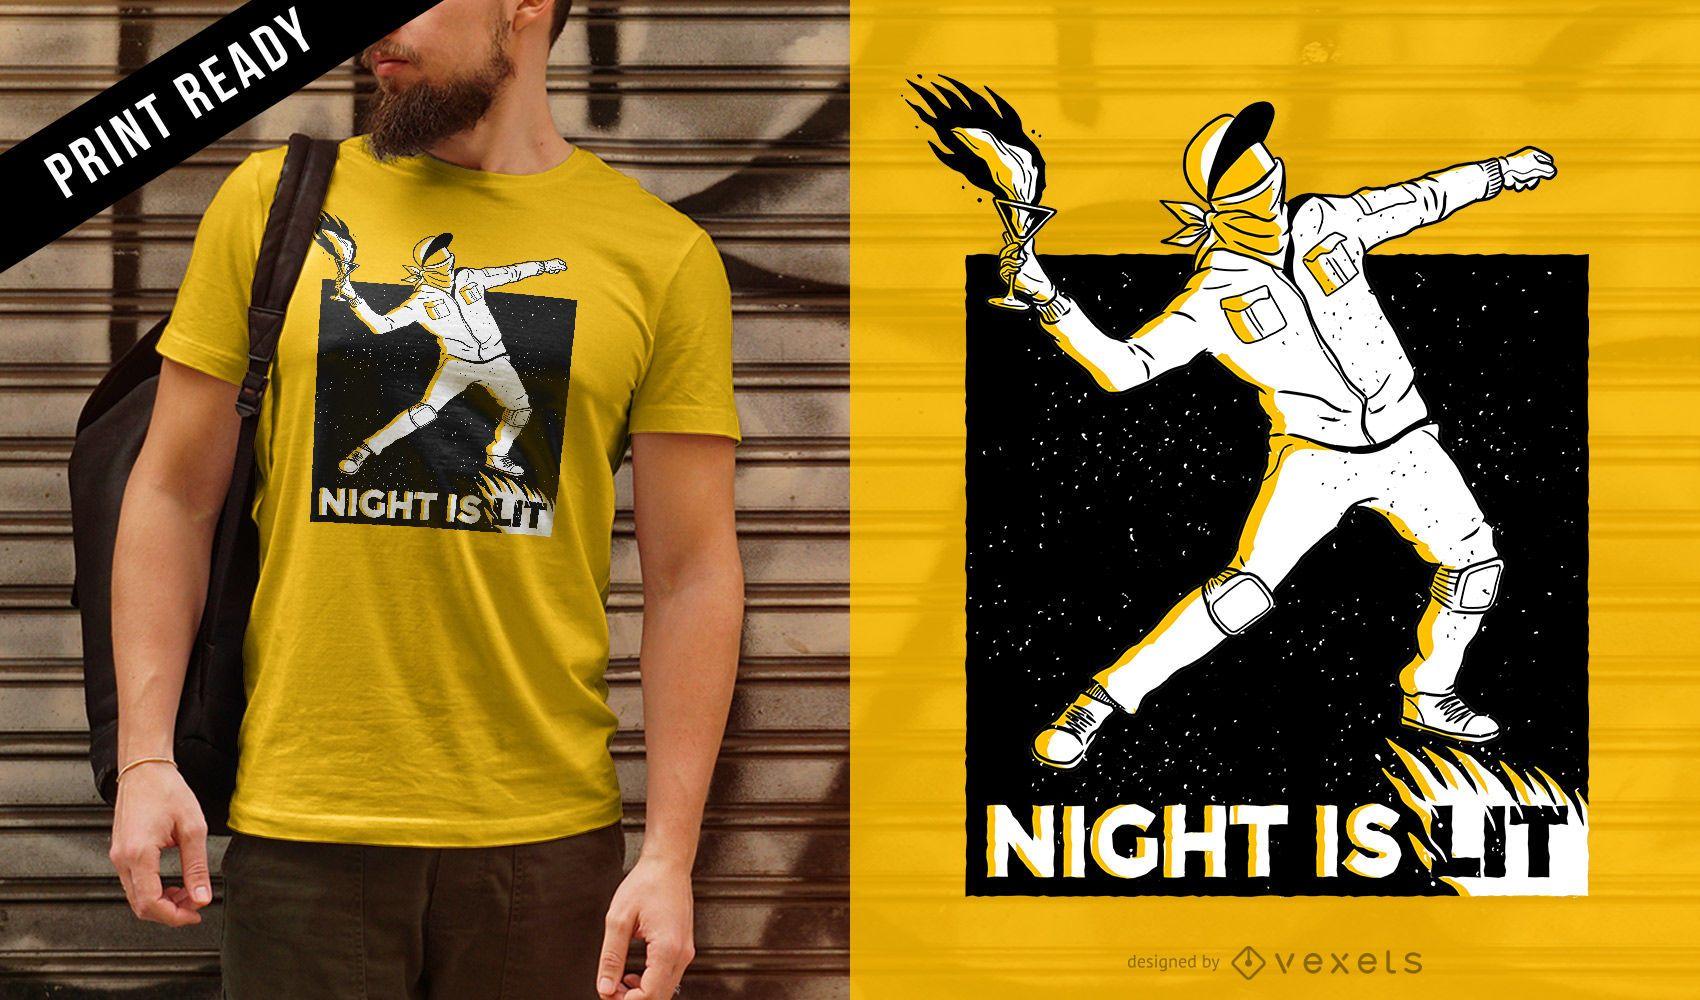 Night is lit t-shirt design